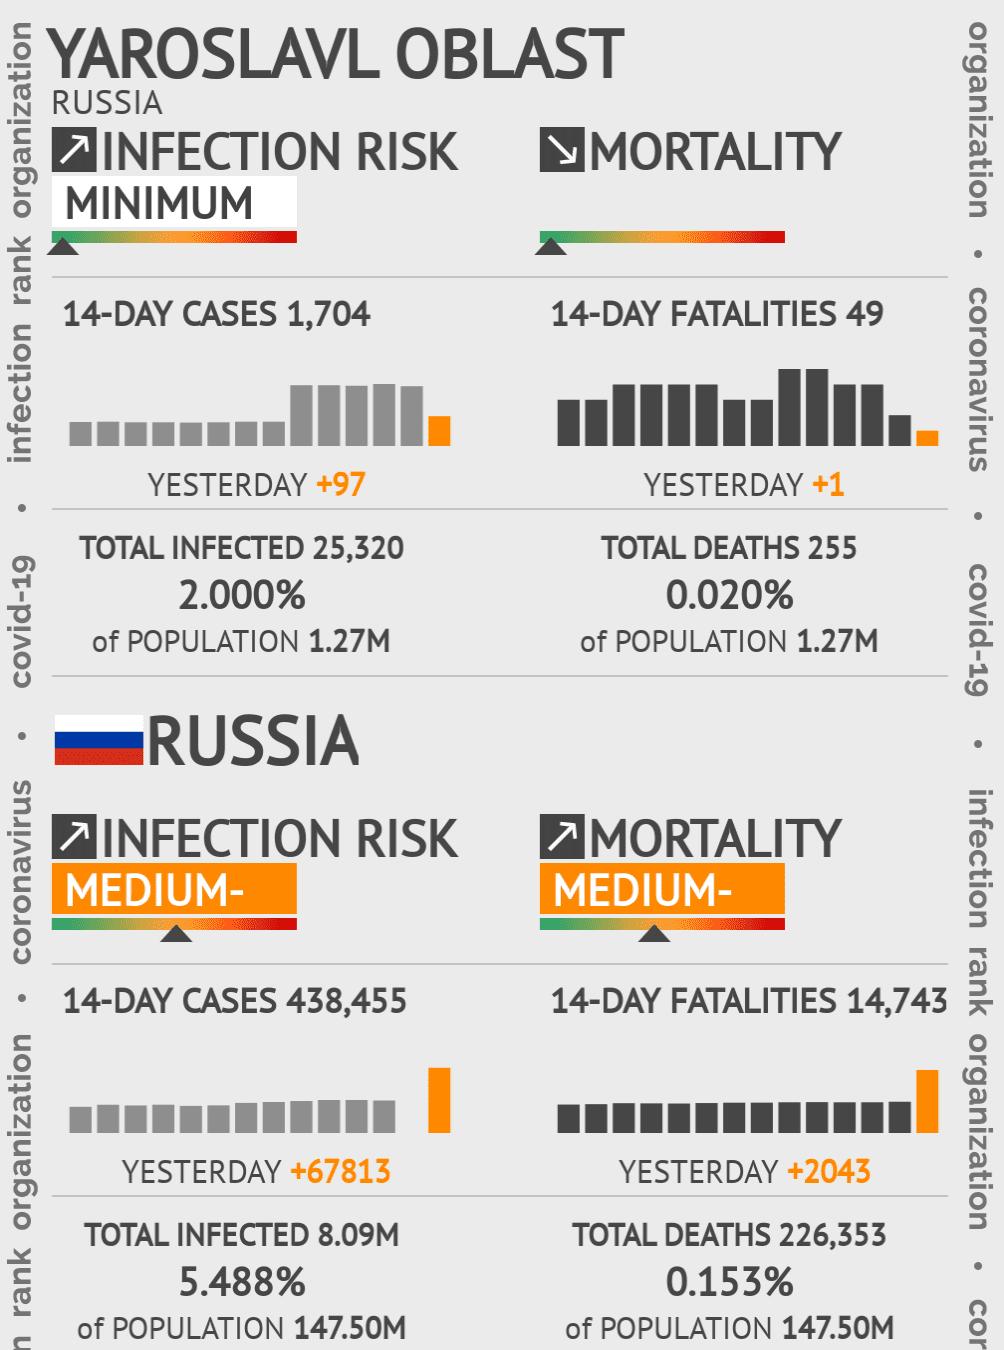 Yaroslavl Oblast Coronavirus Covid-19 Risk of Infection on March 06, 2021